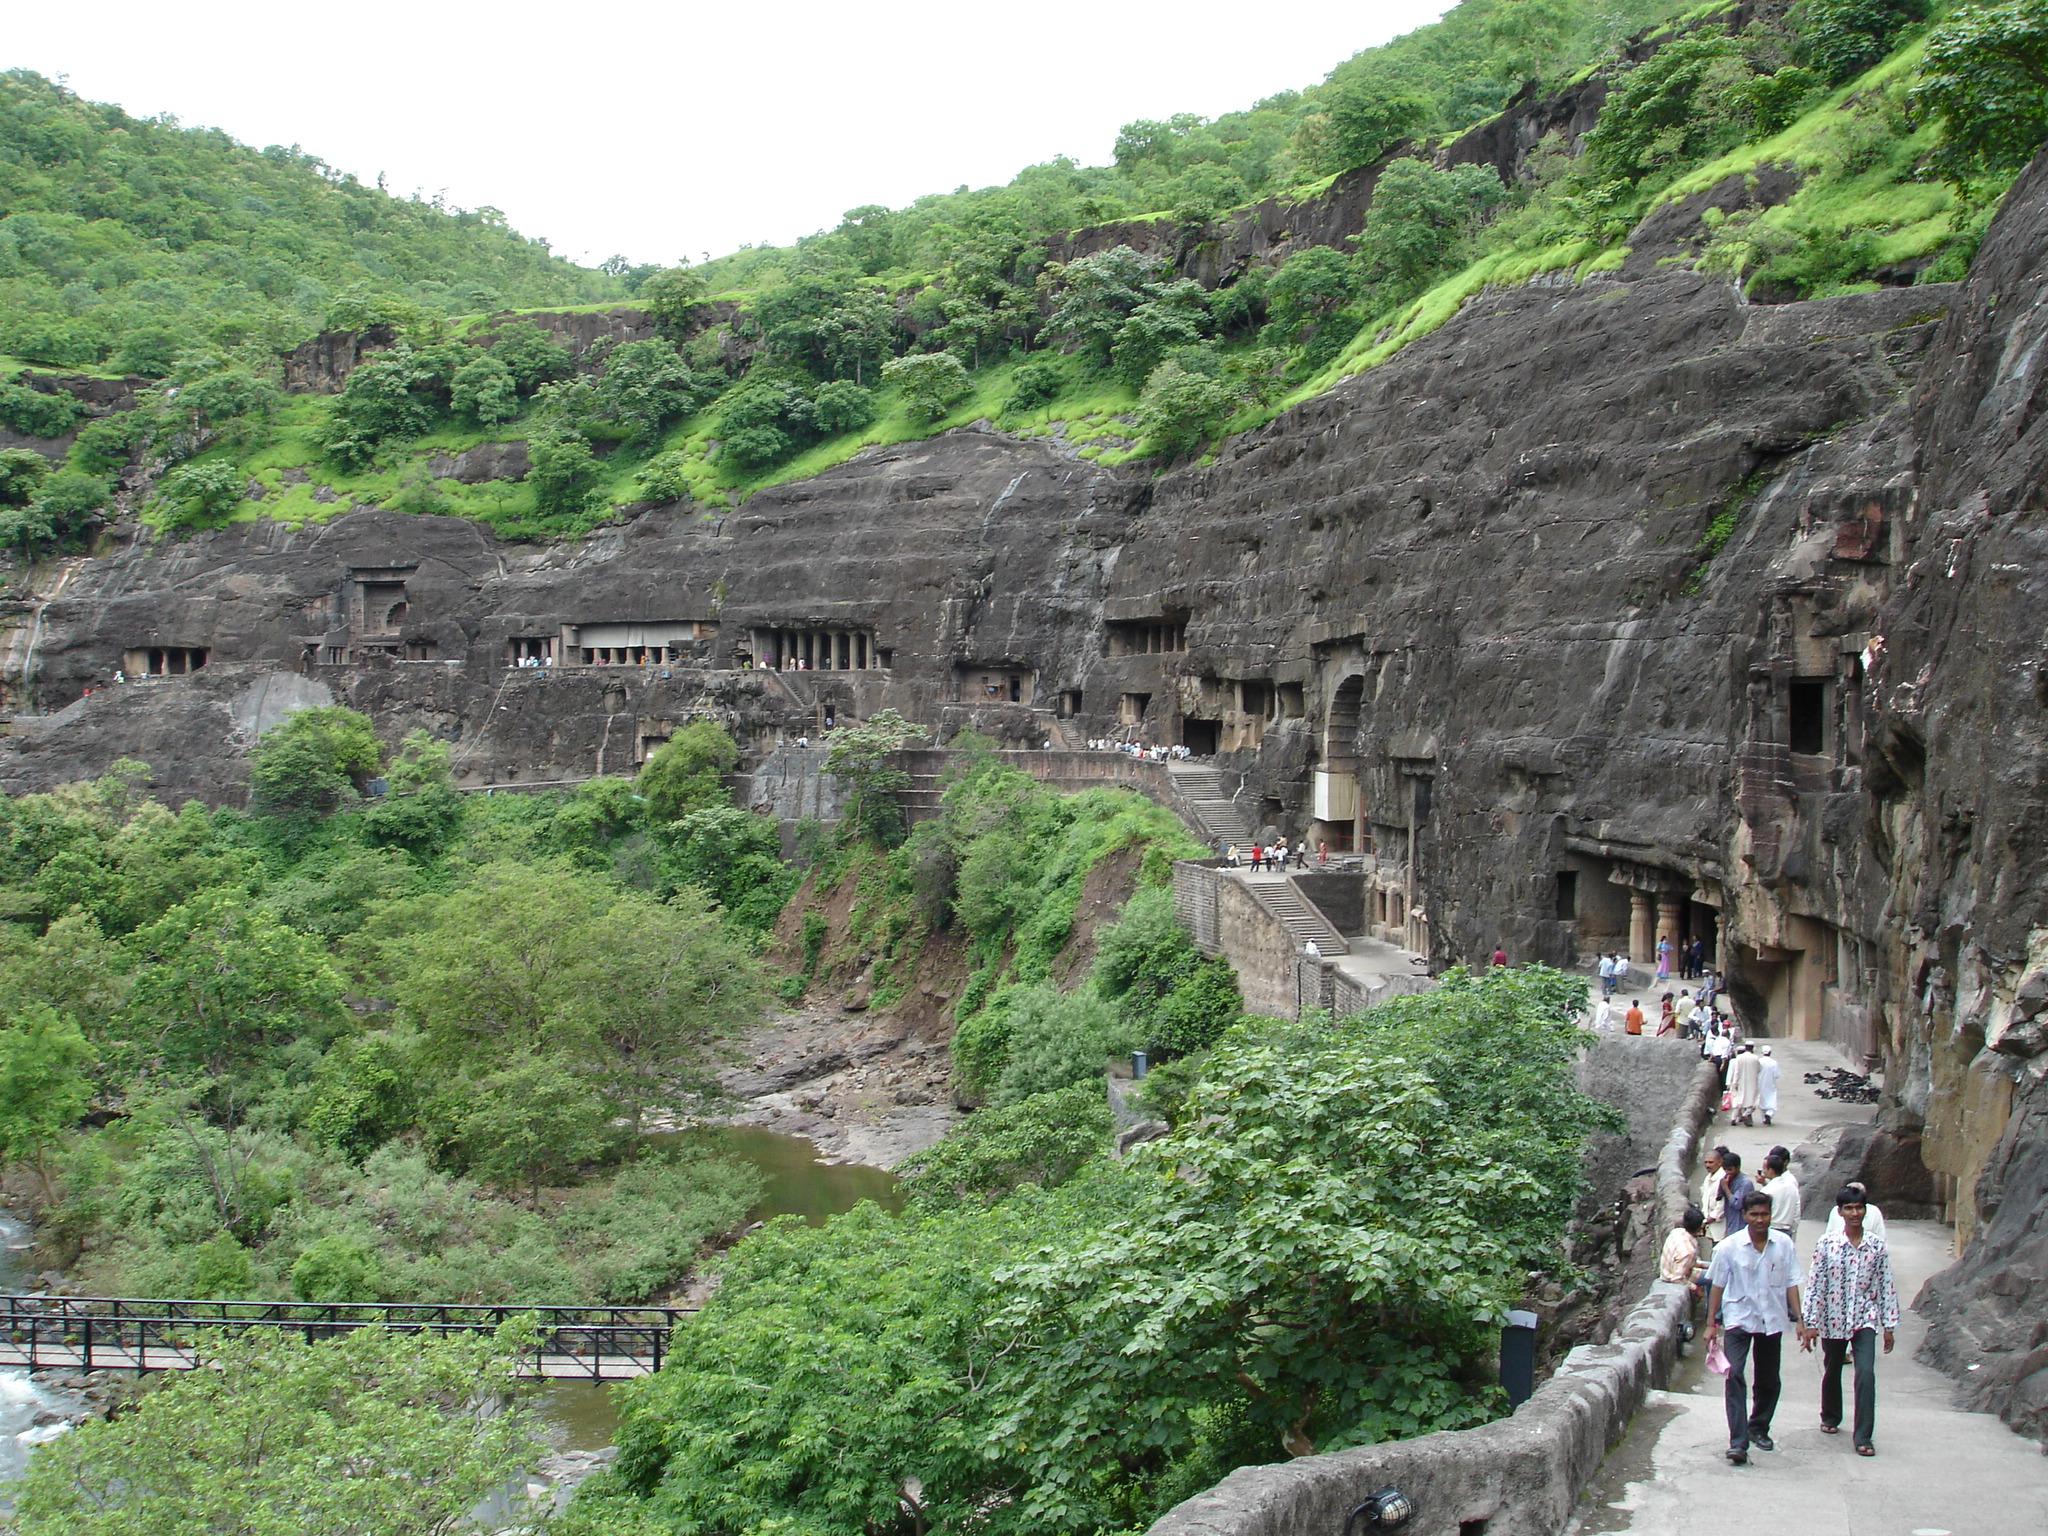 http://upload.wikimedia.org/wikipedia/commons/d/de/Aurangabad_-_Ajanta_Caves_(21).JPG